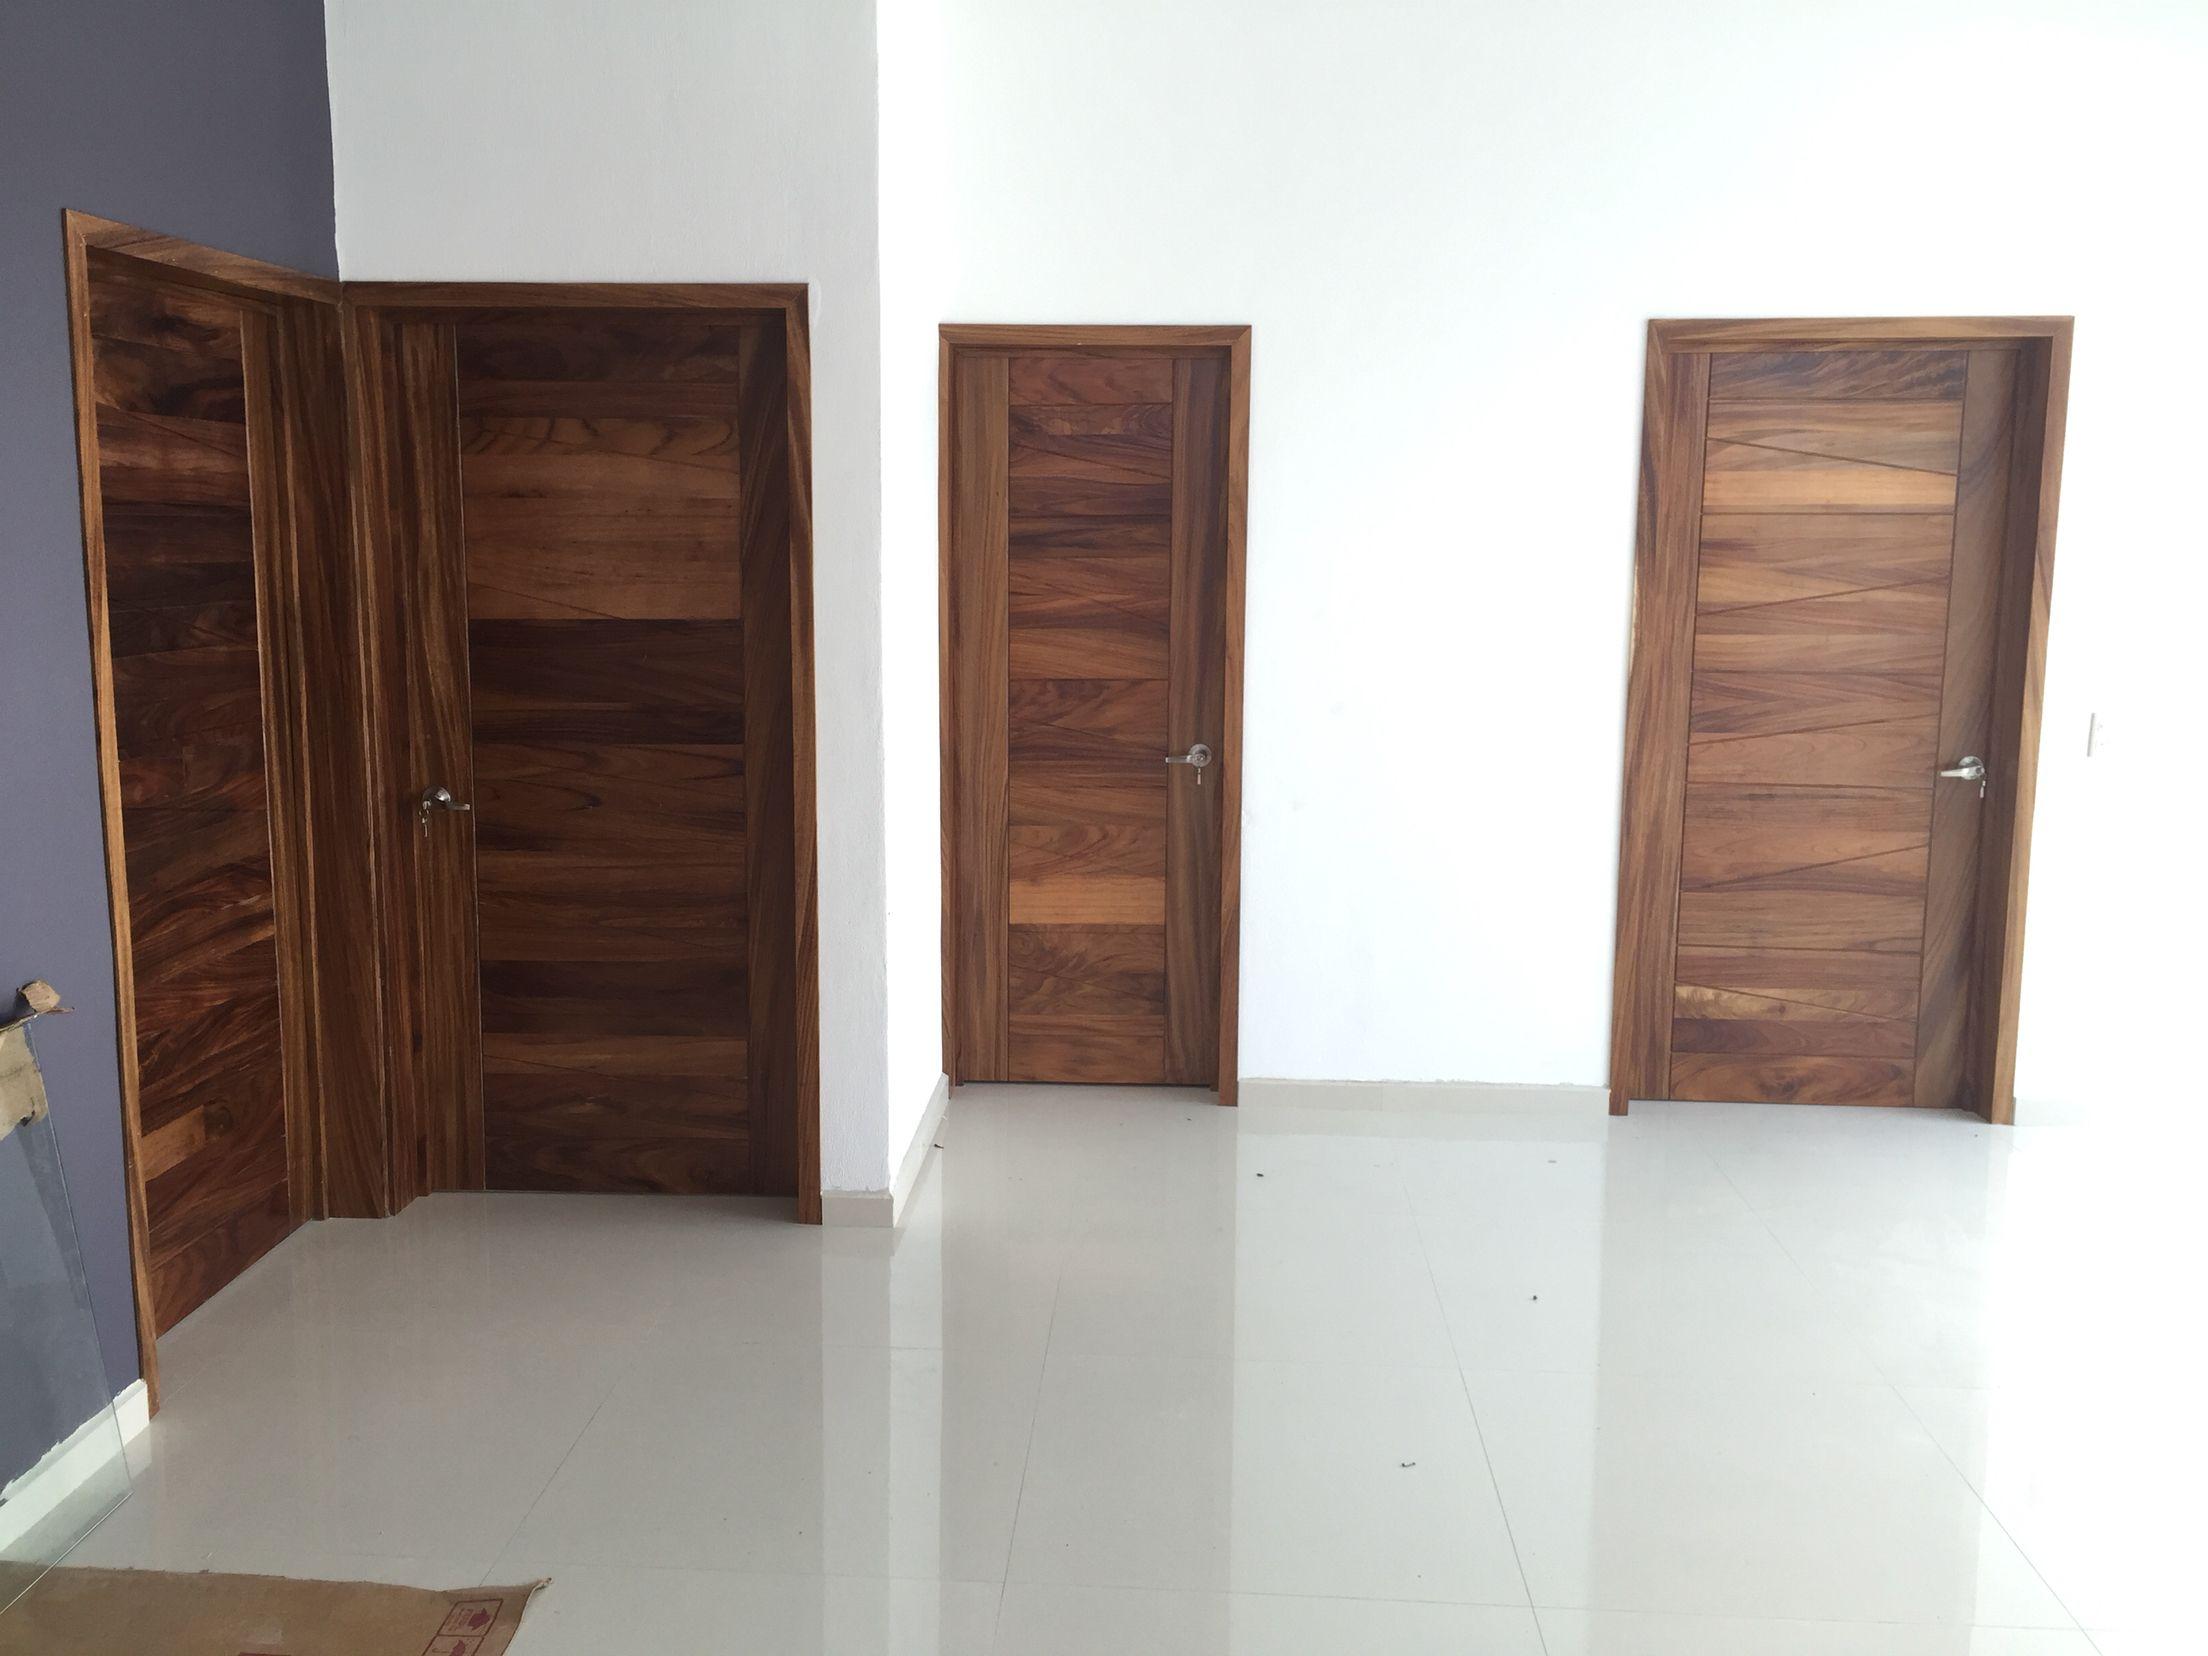 Puertas en madera de parota puertas en 2019 pinterest for Puertas de entrada de madera modernas